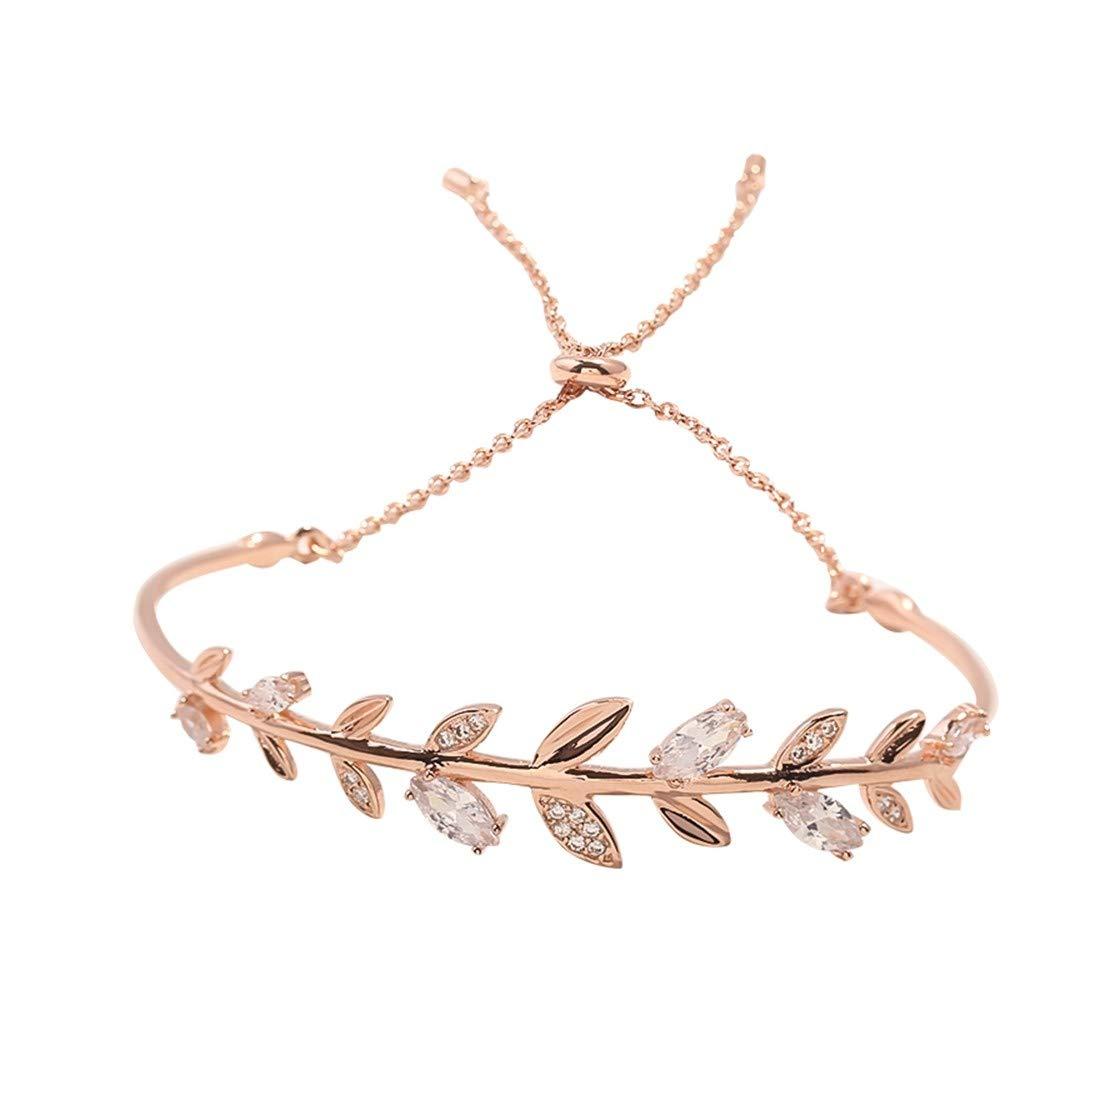 YIYIYAレディースブレスレットS925スターリングシルバージルコンの葉の形を引く素敵な甘い女の子の結婚式の宝石類レディースジュエリーギフト   B07LH21DY9